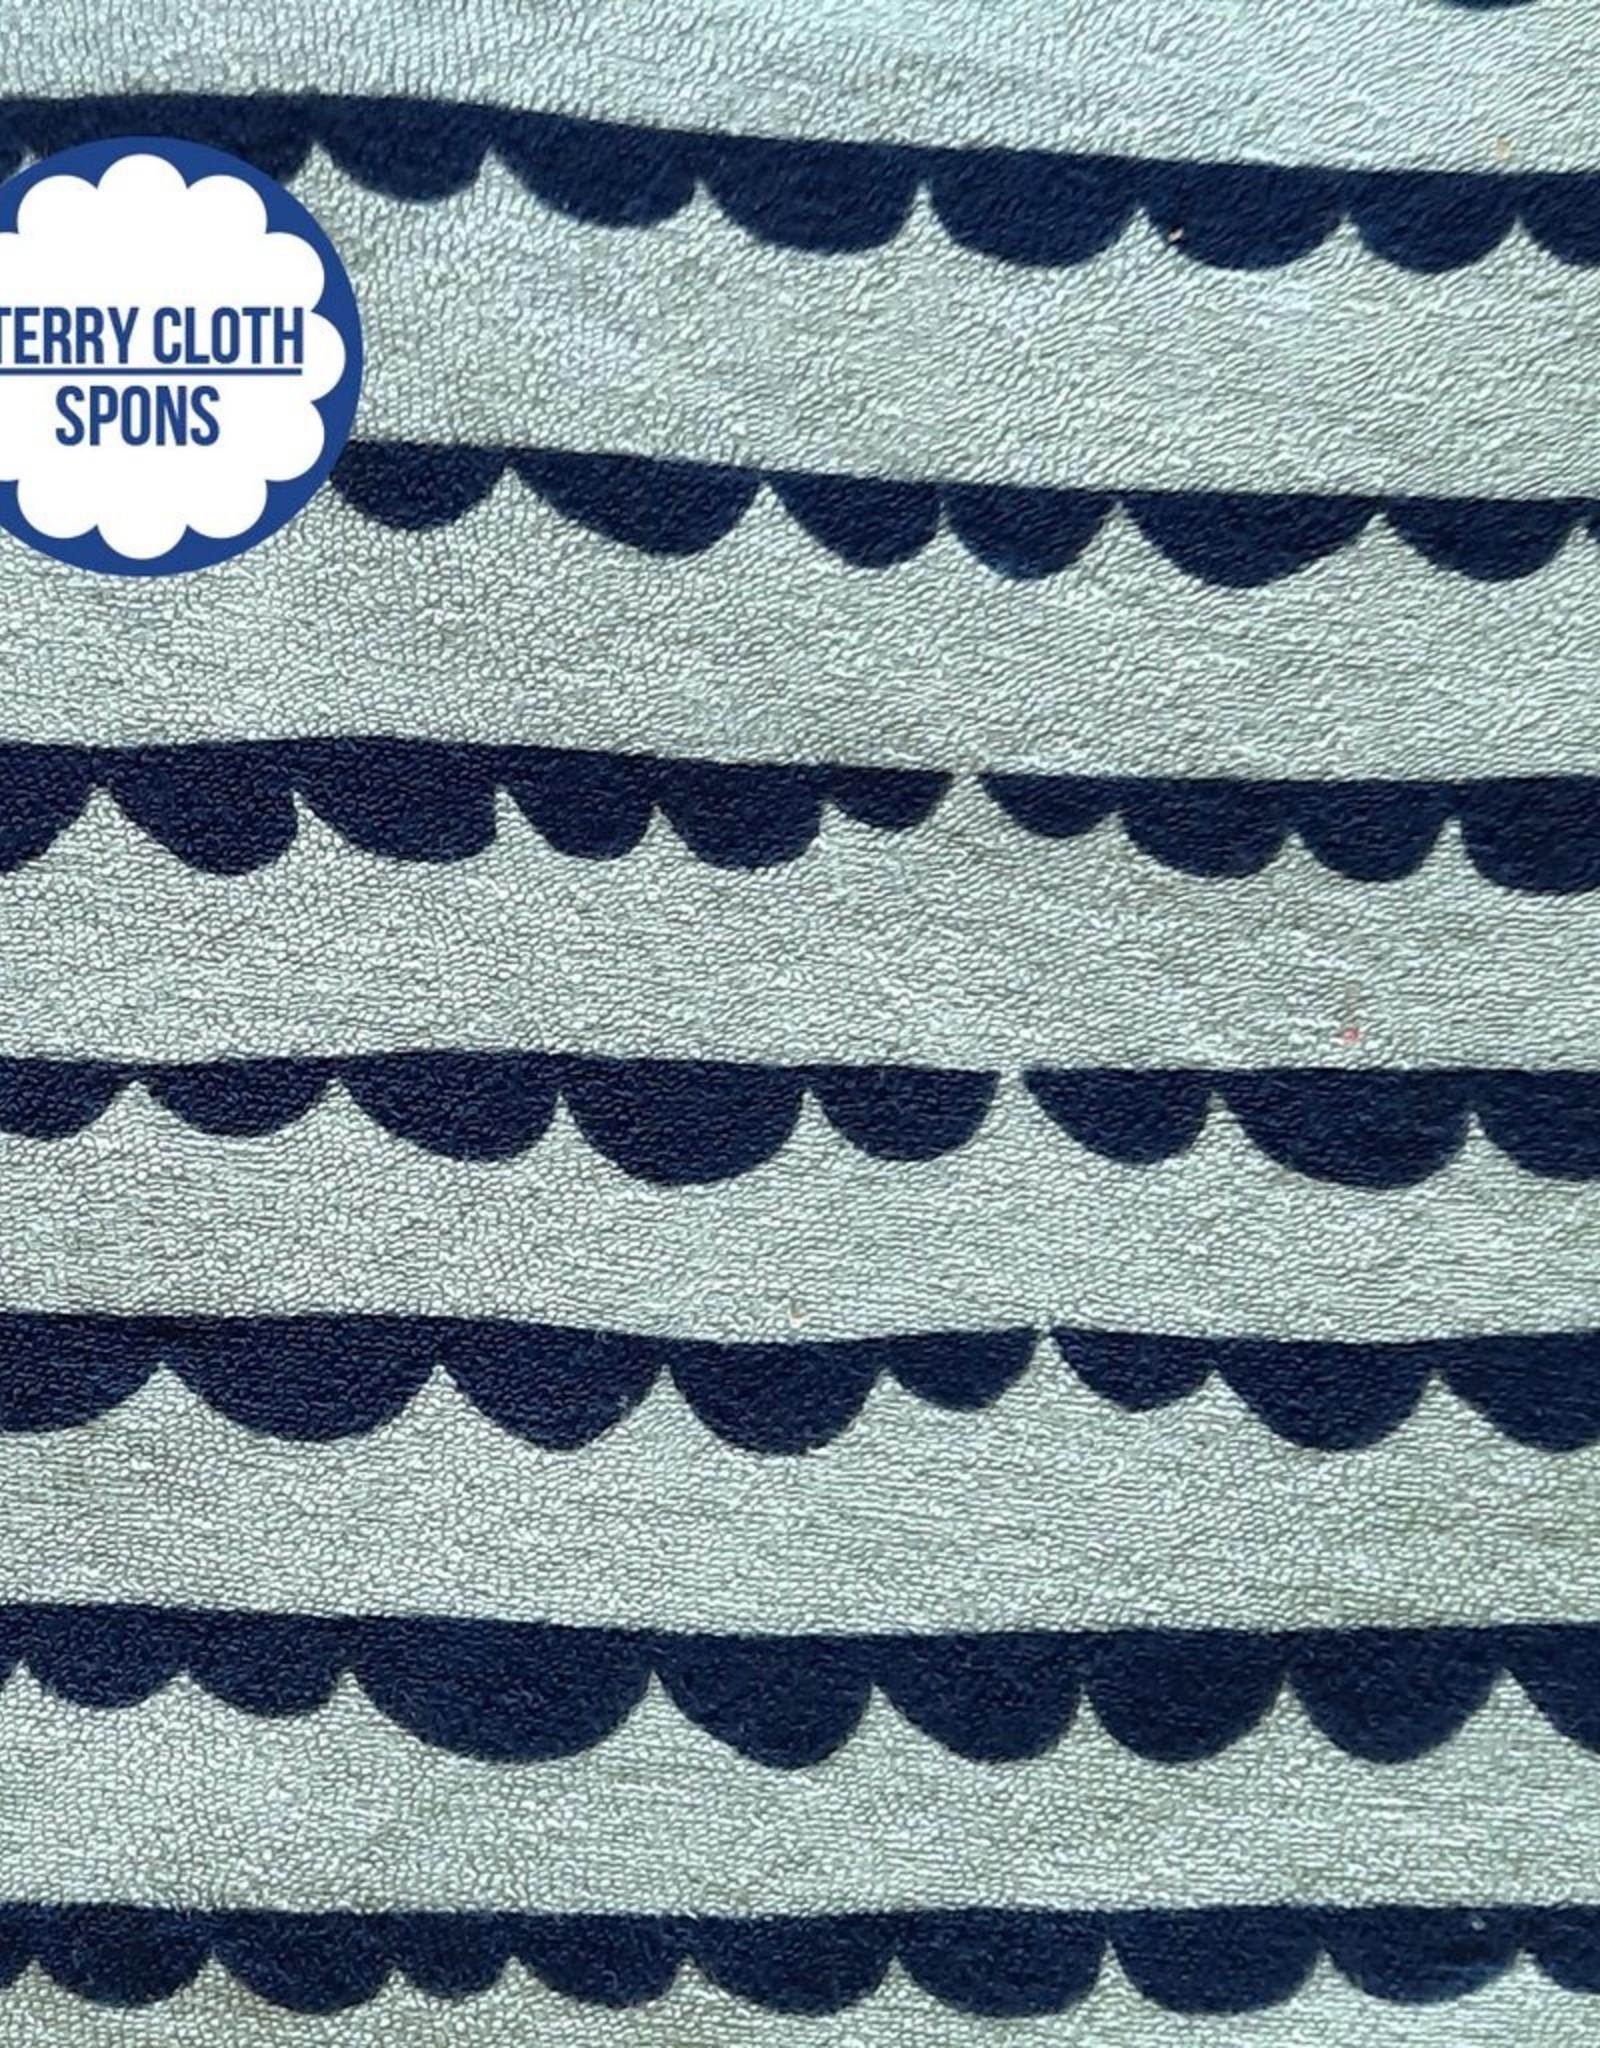 About Blue Fabrics Sea You - DOTTY STRIPES (Sponge/Terry Cloth)